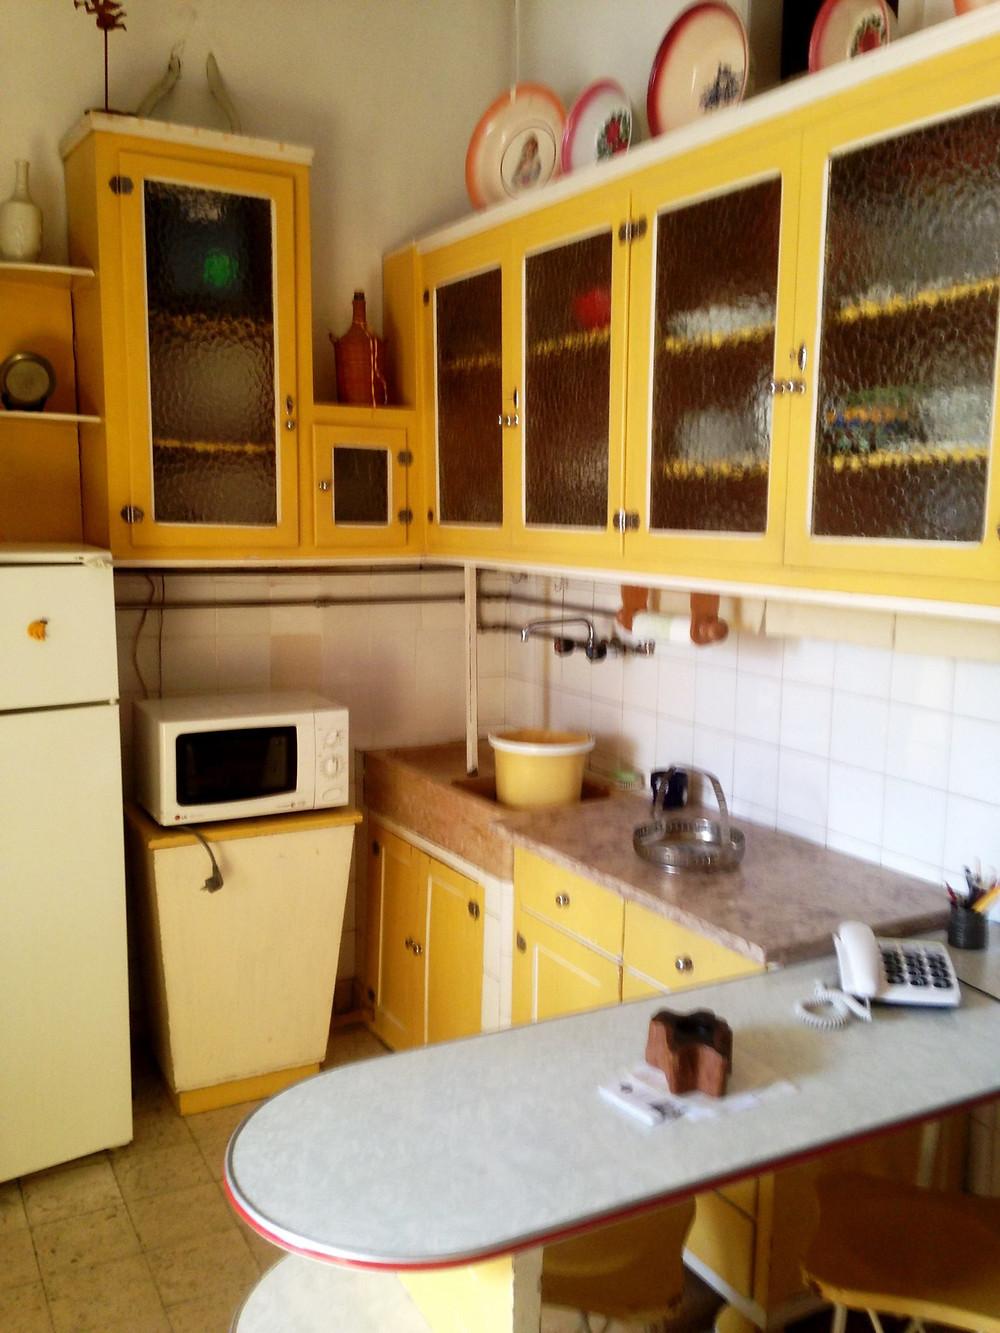 The 40s kitchen